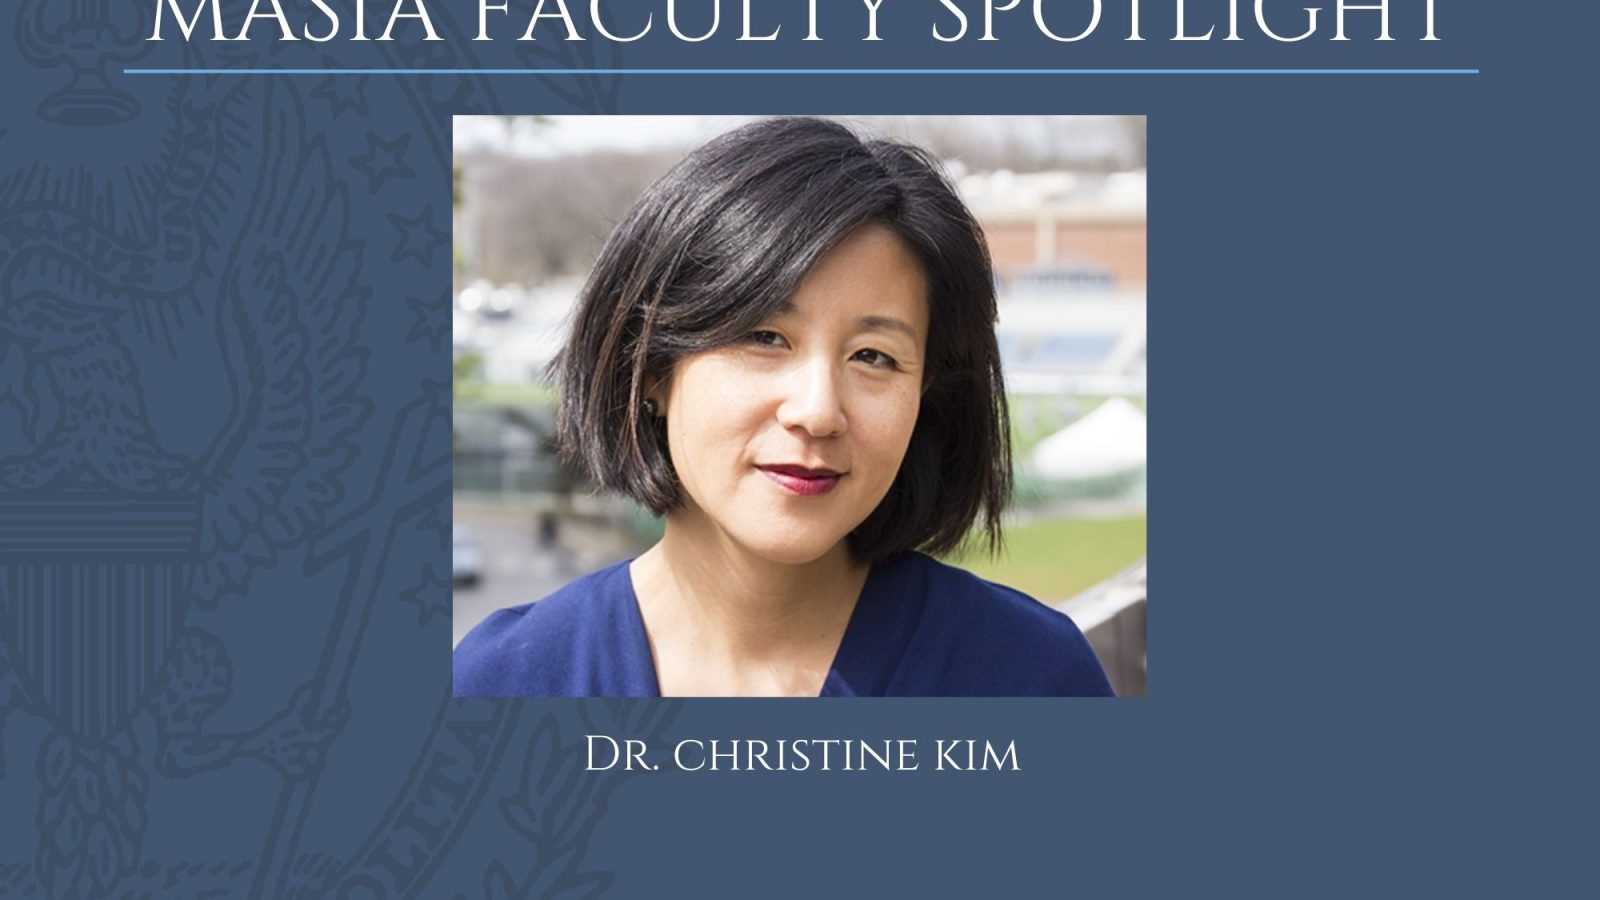 MASIA Faculty Spotlight Dr. Christine Kim